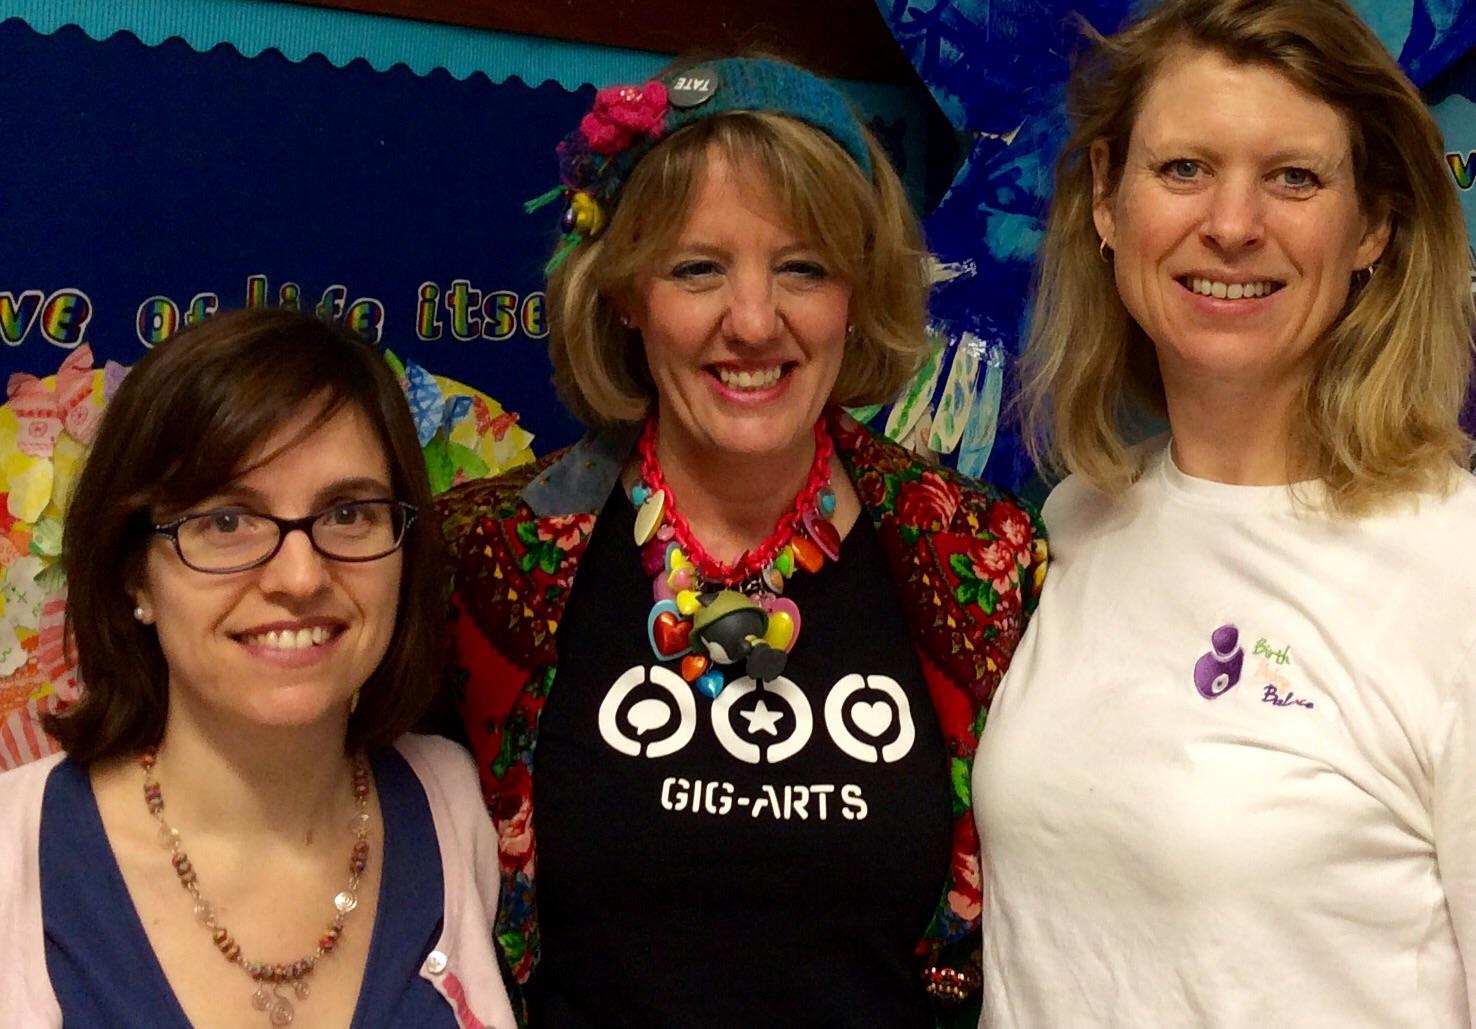 Speakers Rachel Cox, Abbie Cooke and Sarah Boyd